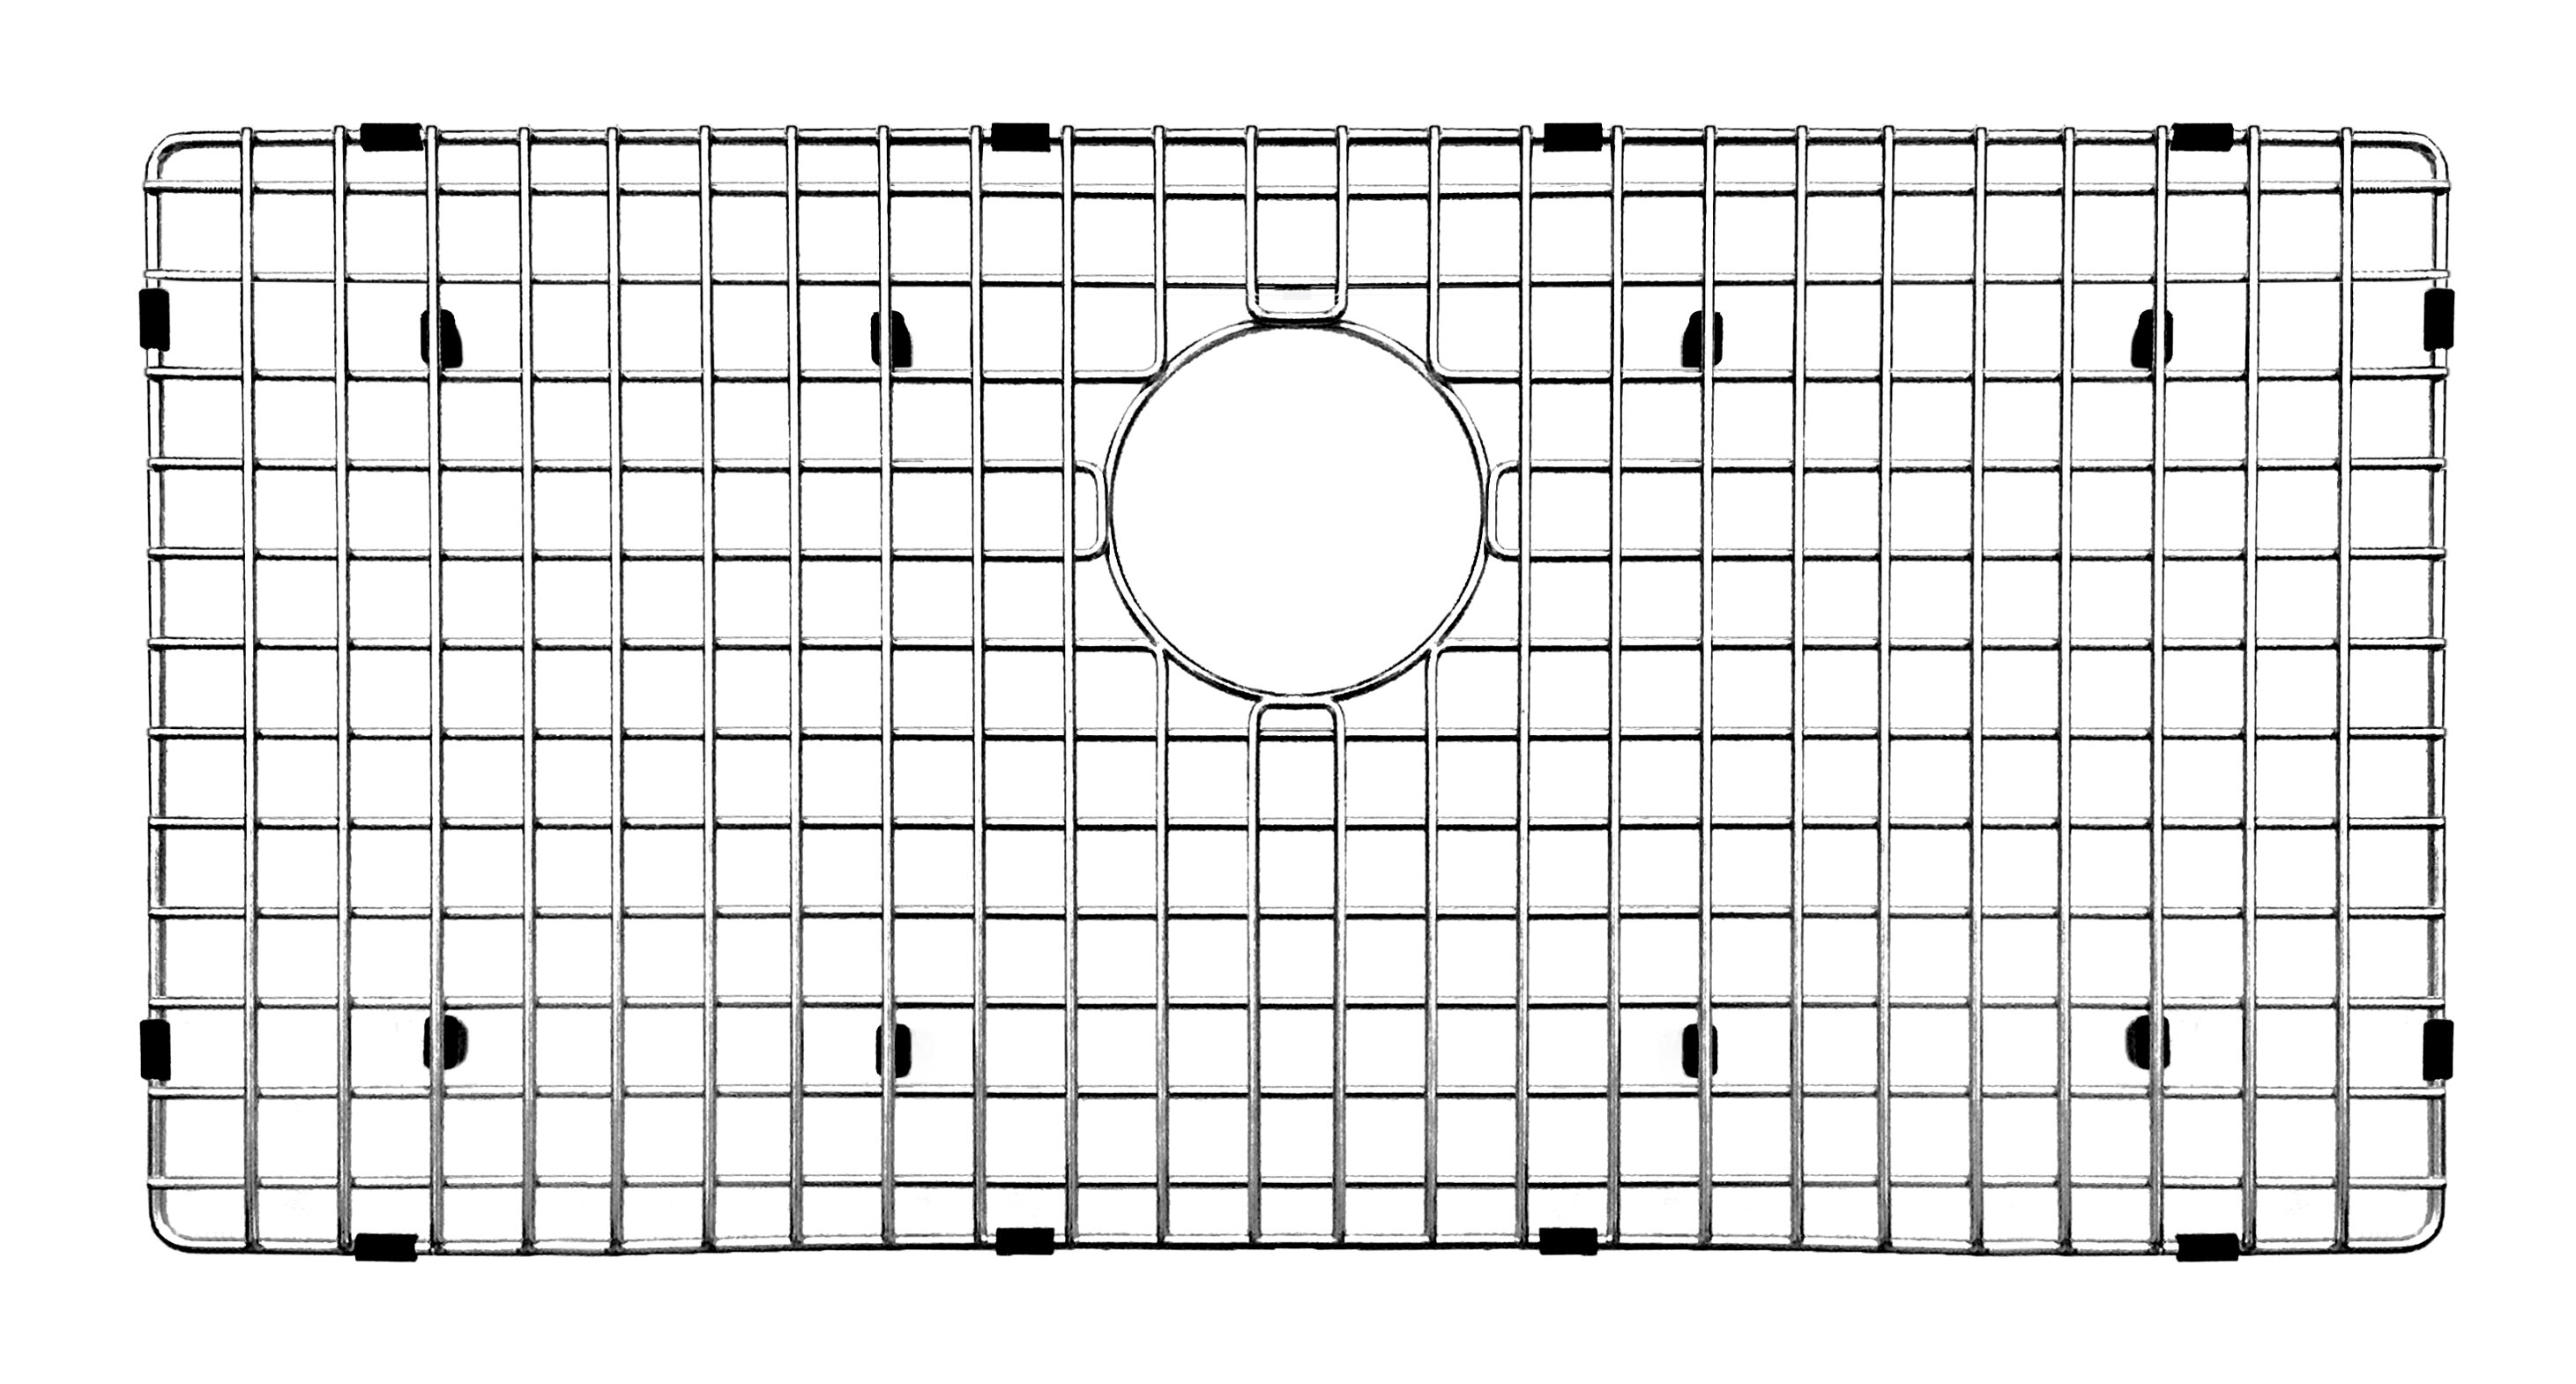 Daweier 30 X 15 Sink Grid Reviews Wayfair